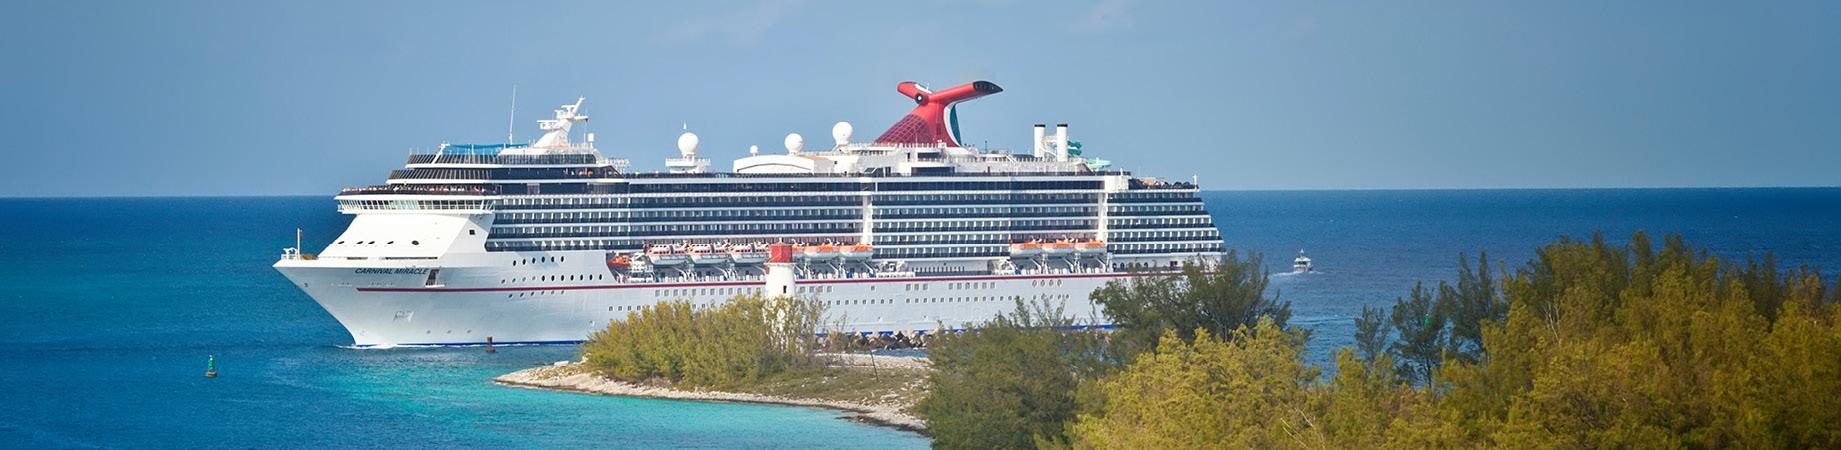 Alana's Cruise Dreams